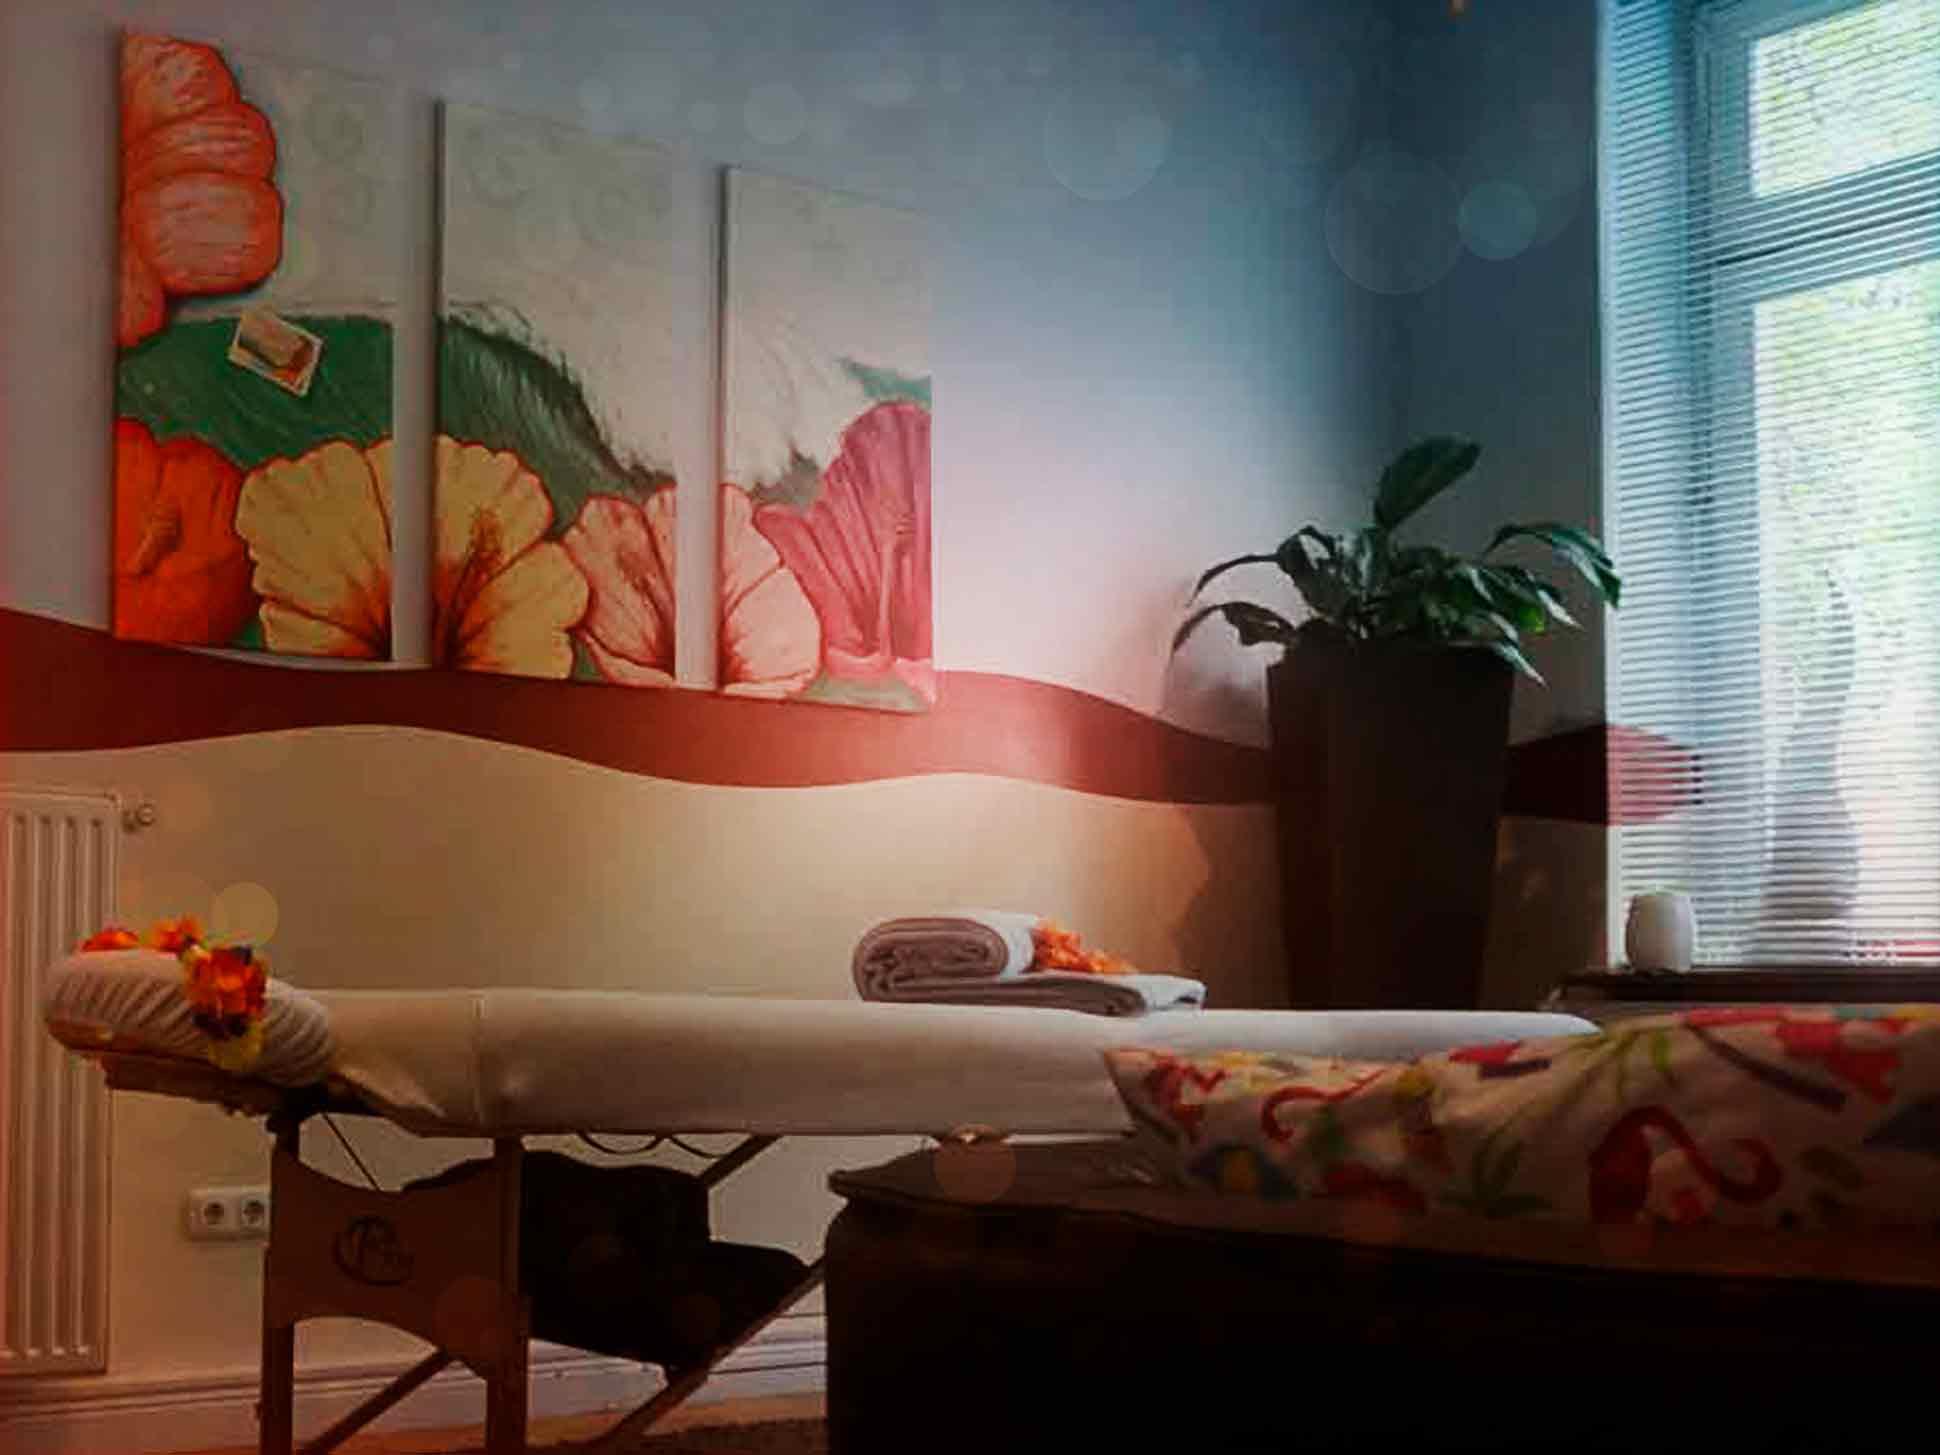 Behandlungsliege-Fenster_blauton